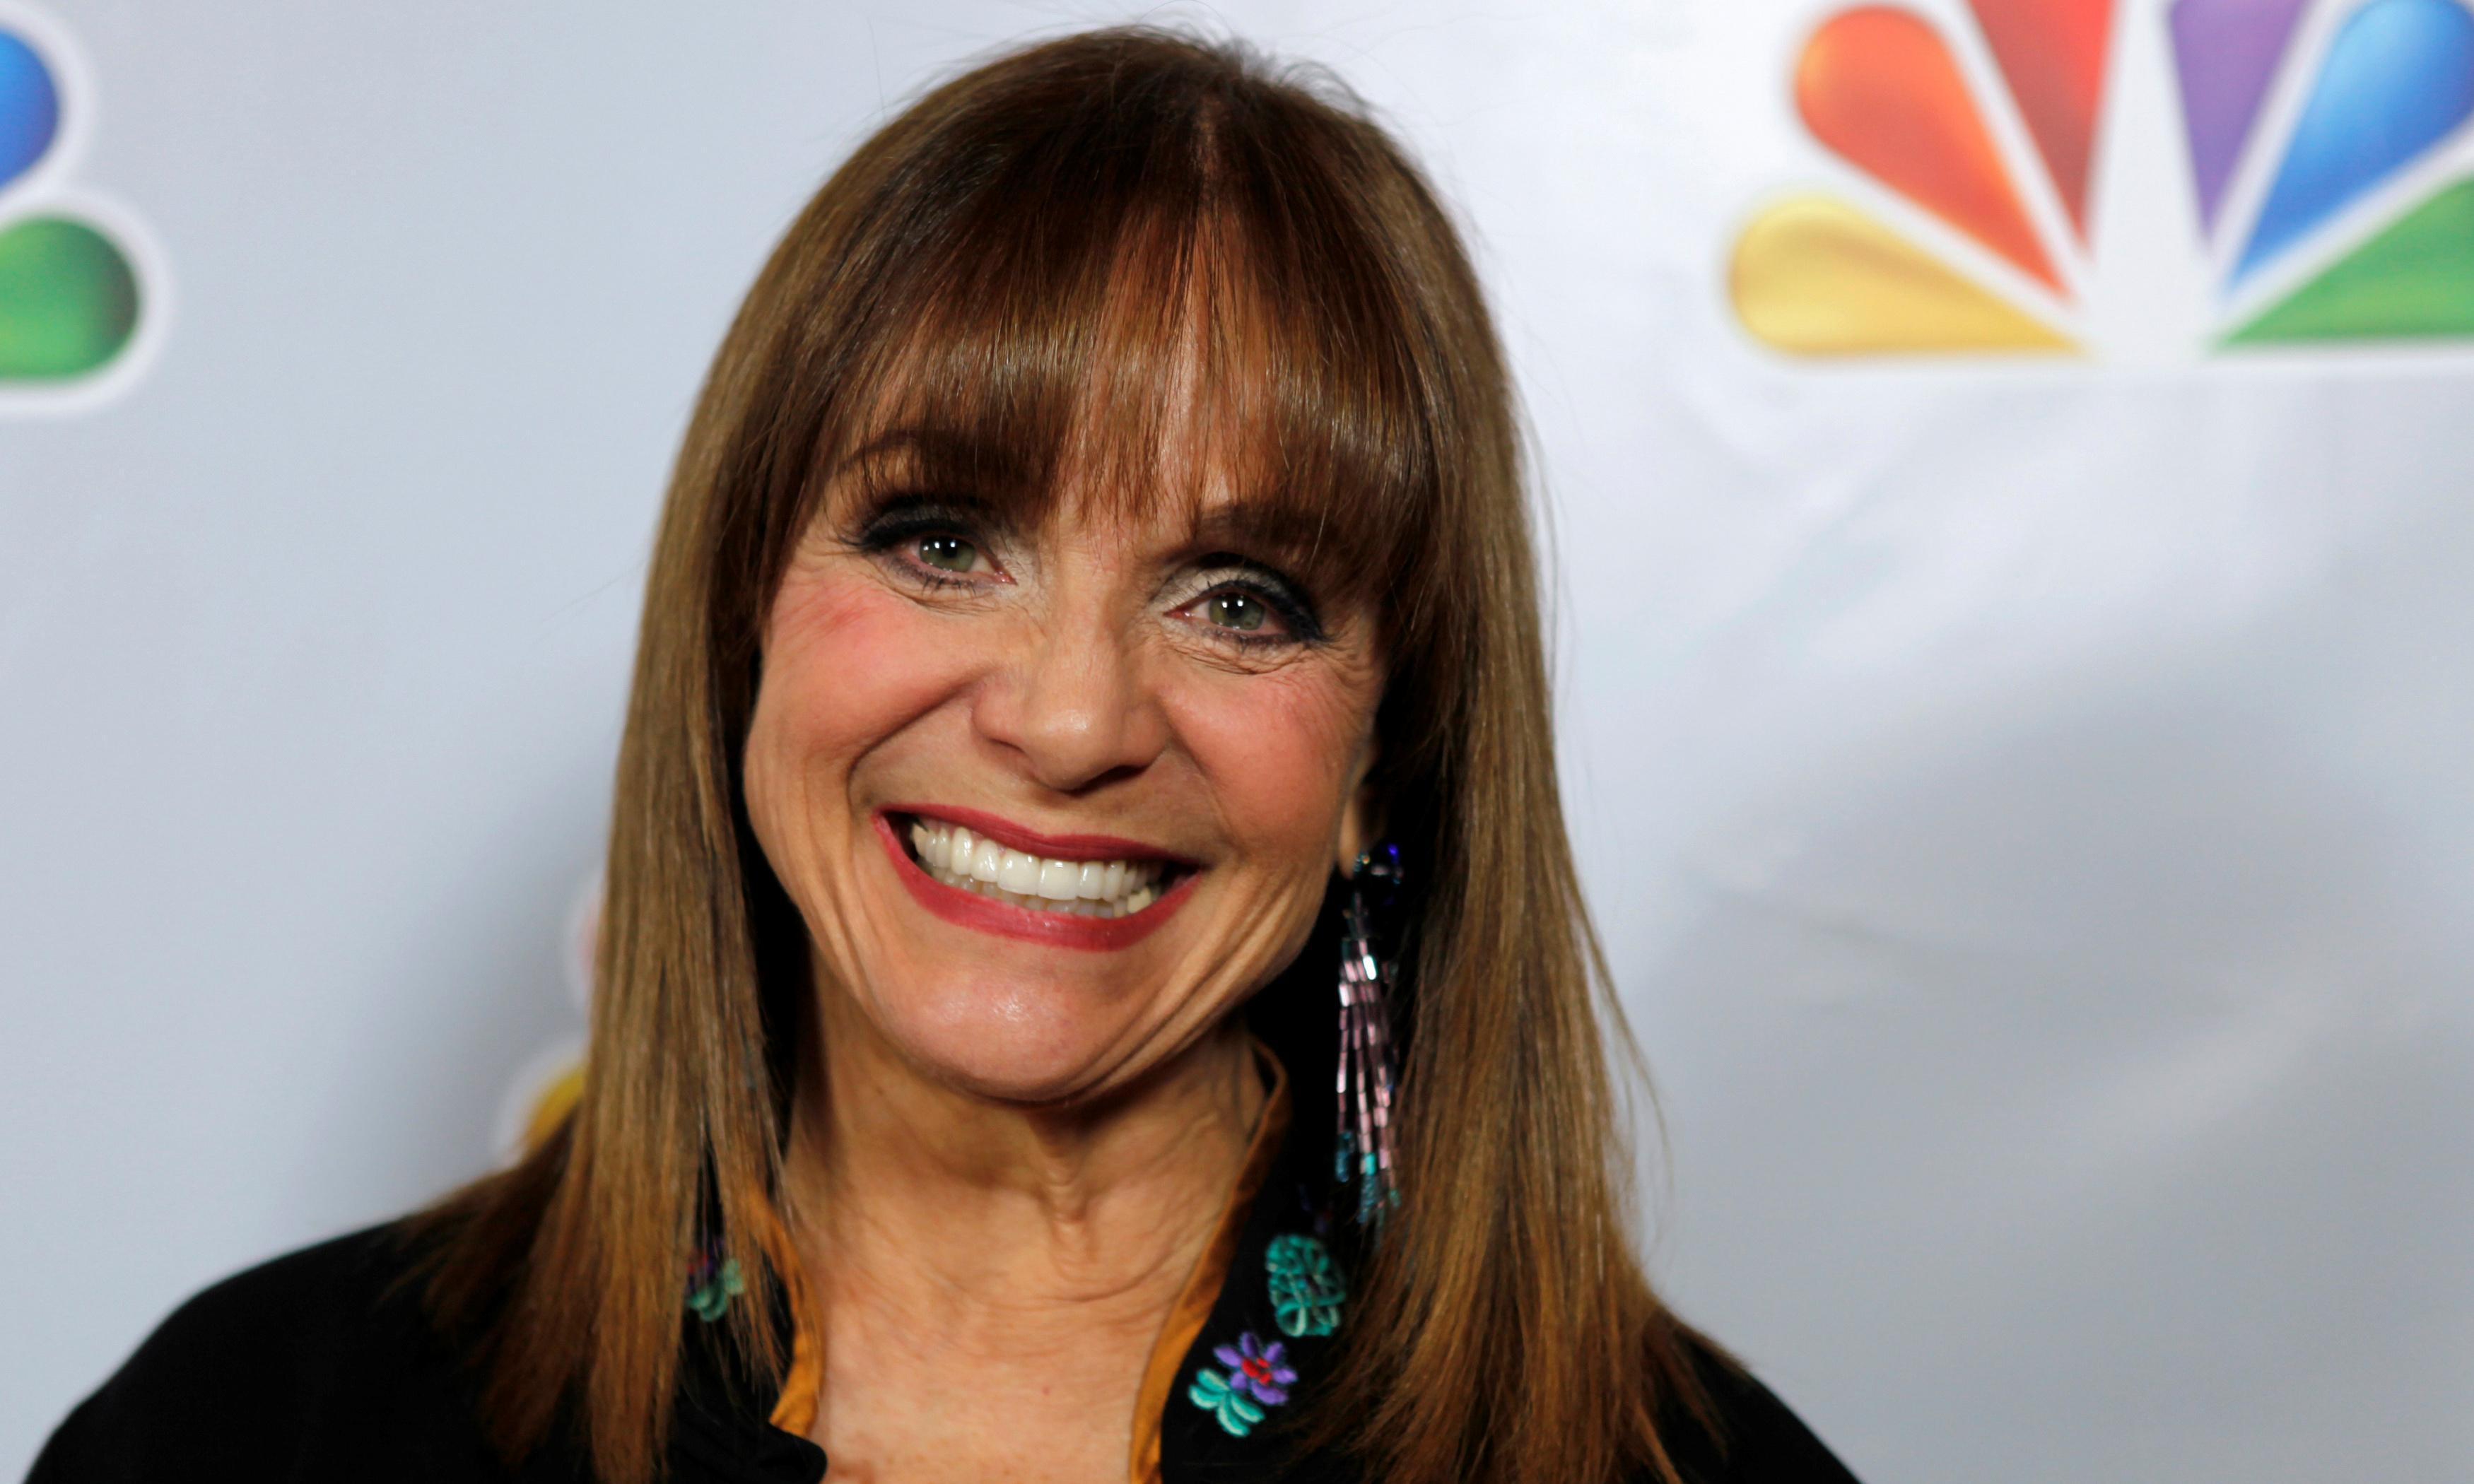 Valerie Harper, Emmy award-winning star of TV series Rhoda, dies aged 80